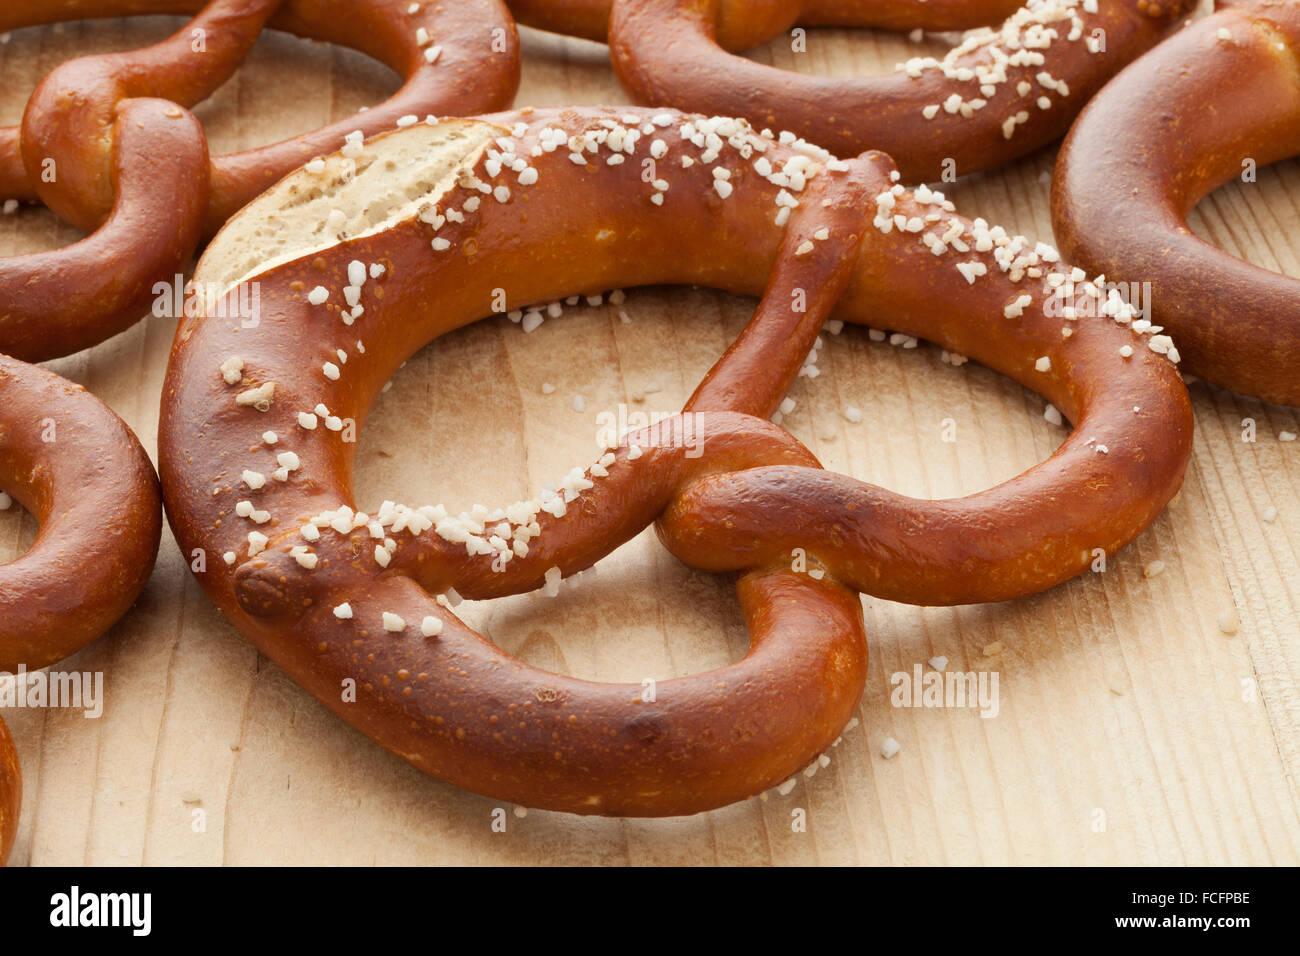 Fresh soft pretzels with salt - Stock Image